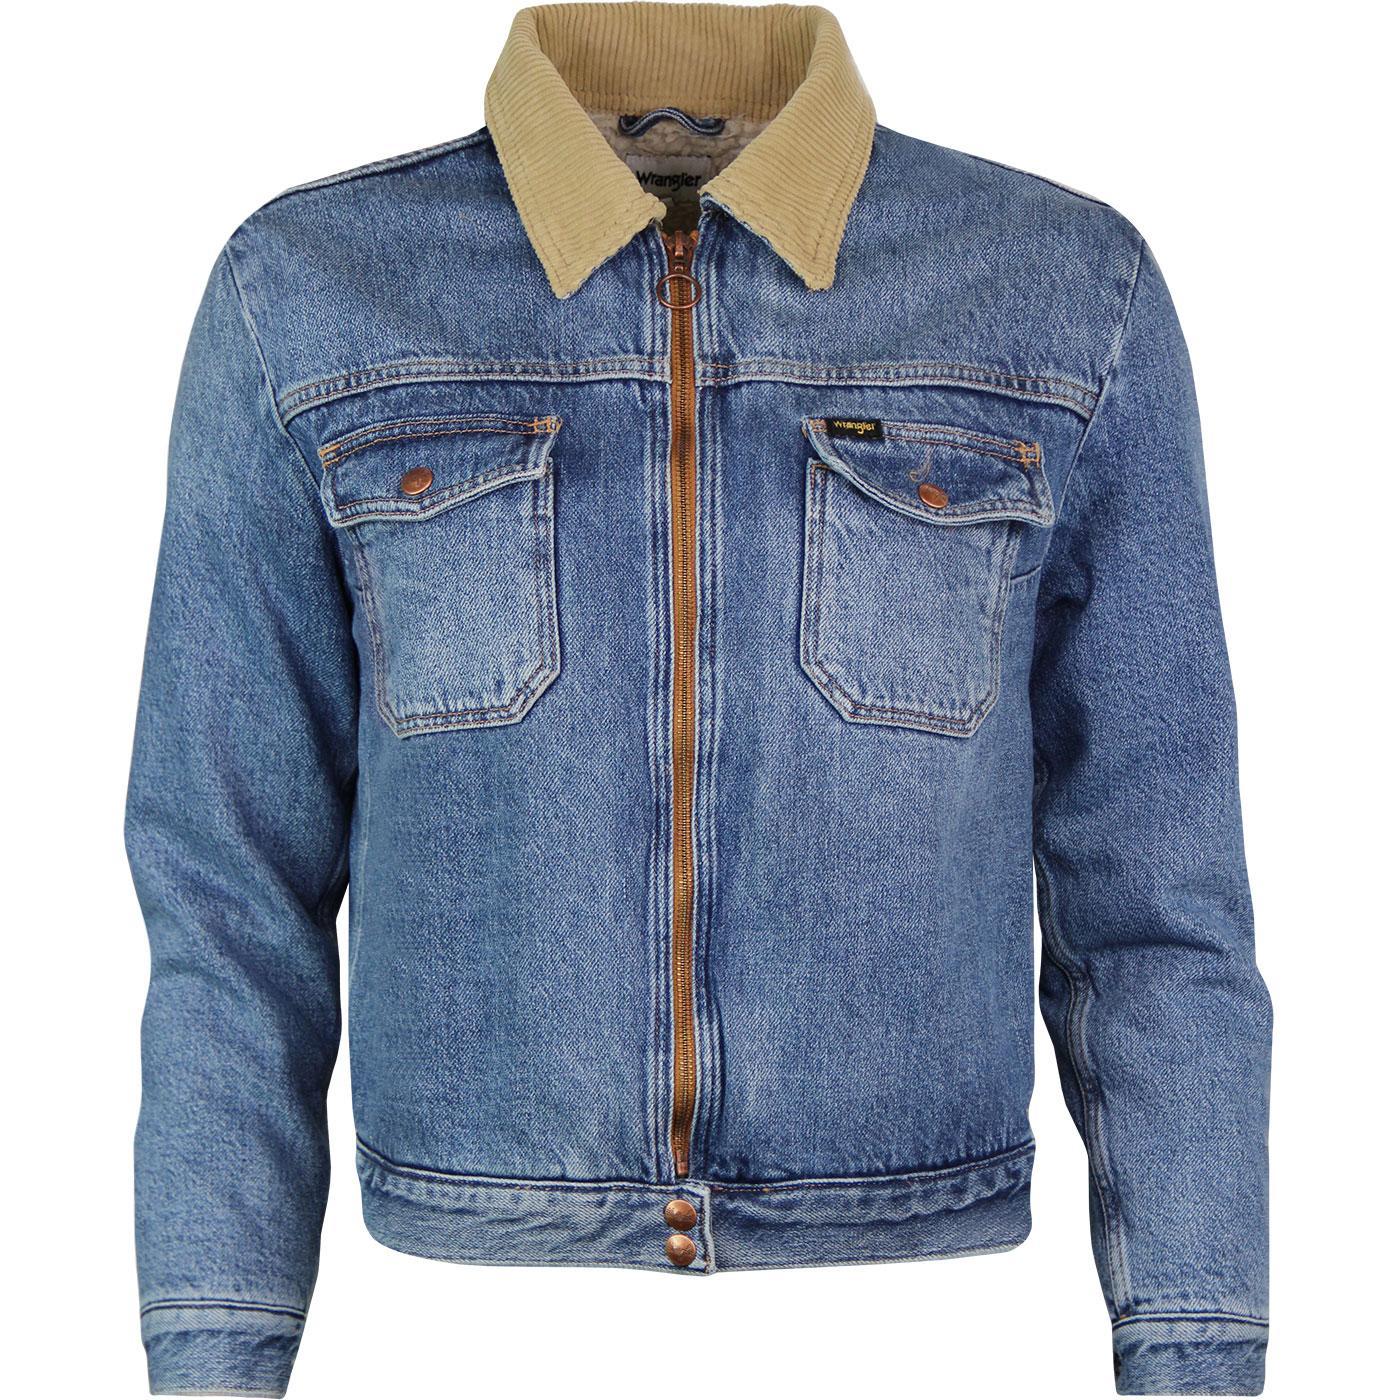 WRANGLER Womens Cord Collar Denim Carpenter Jacket